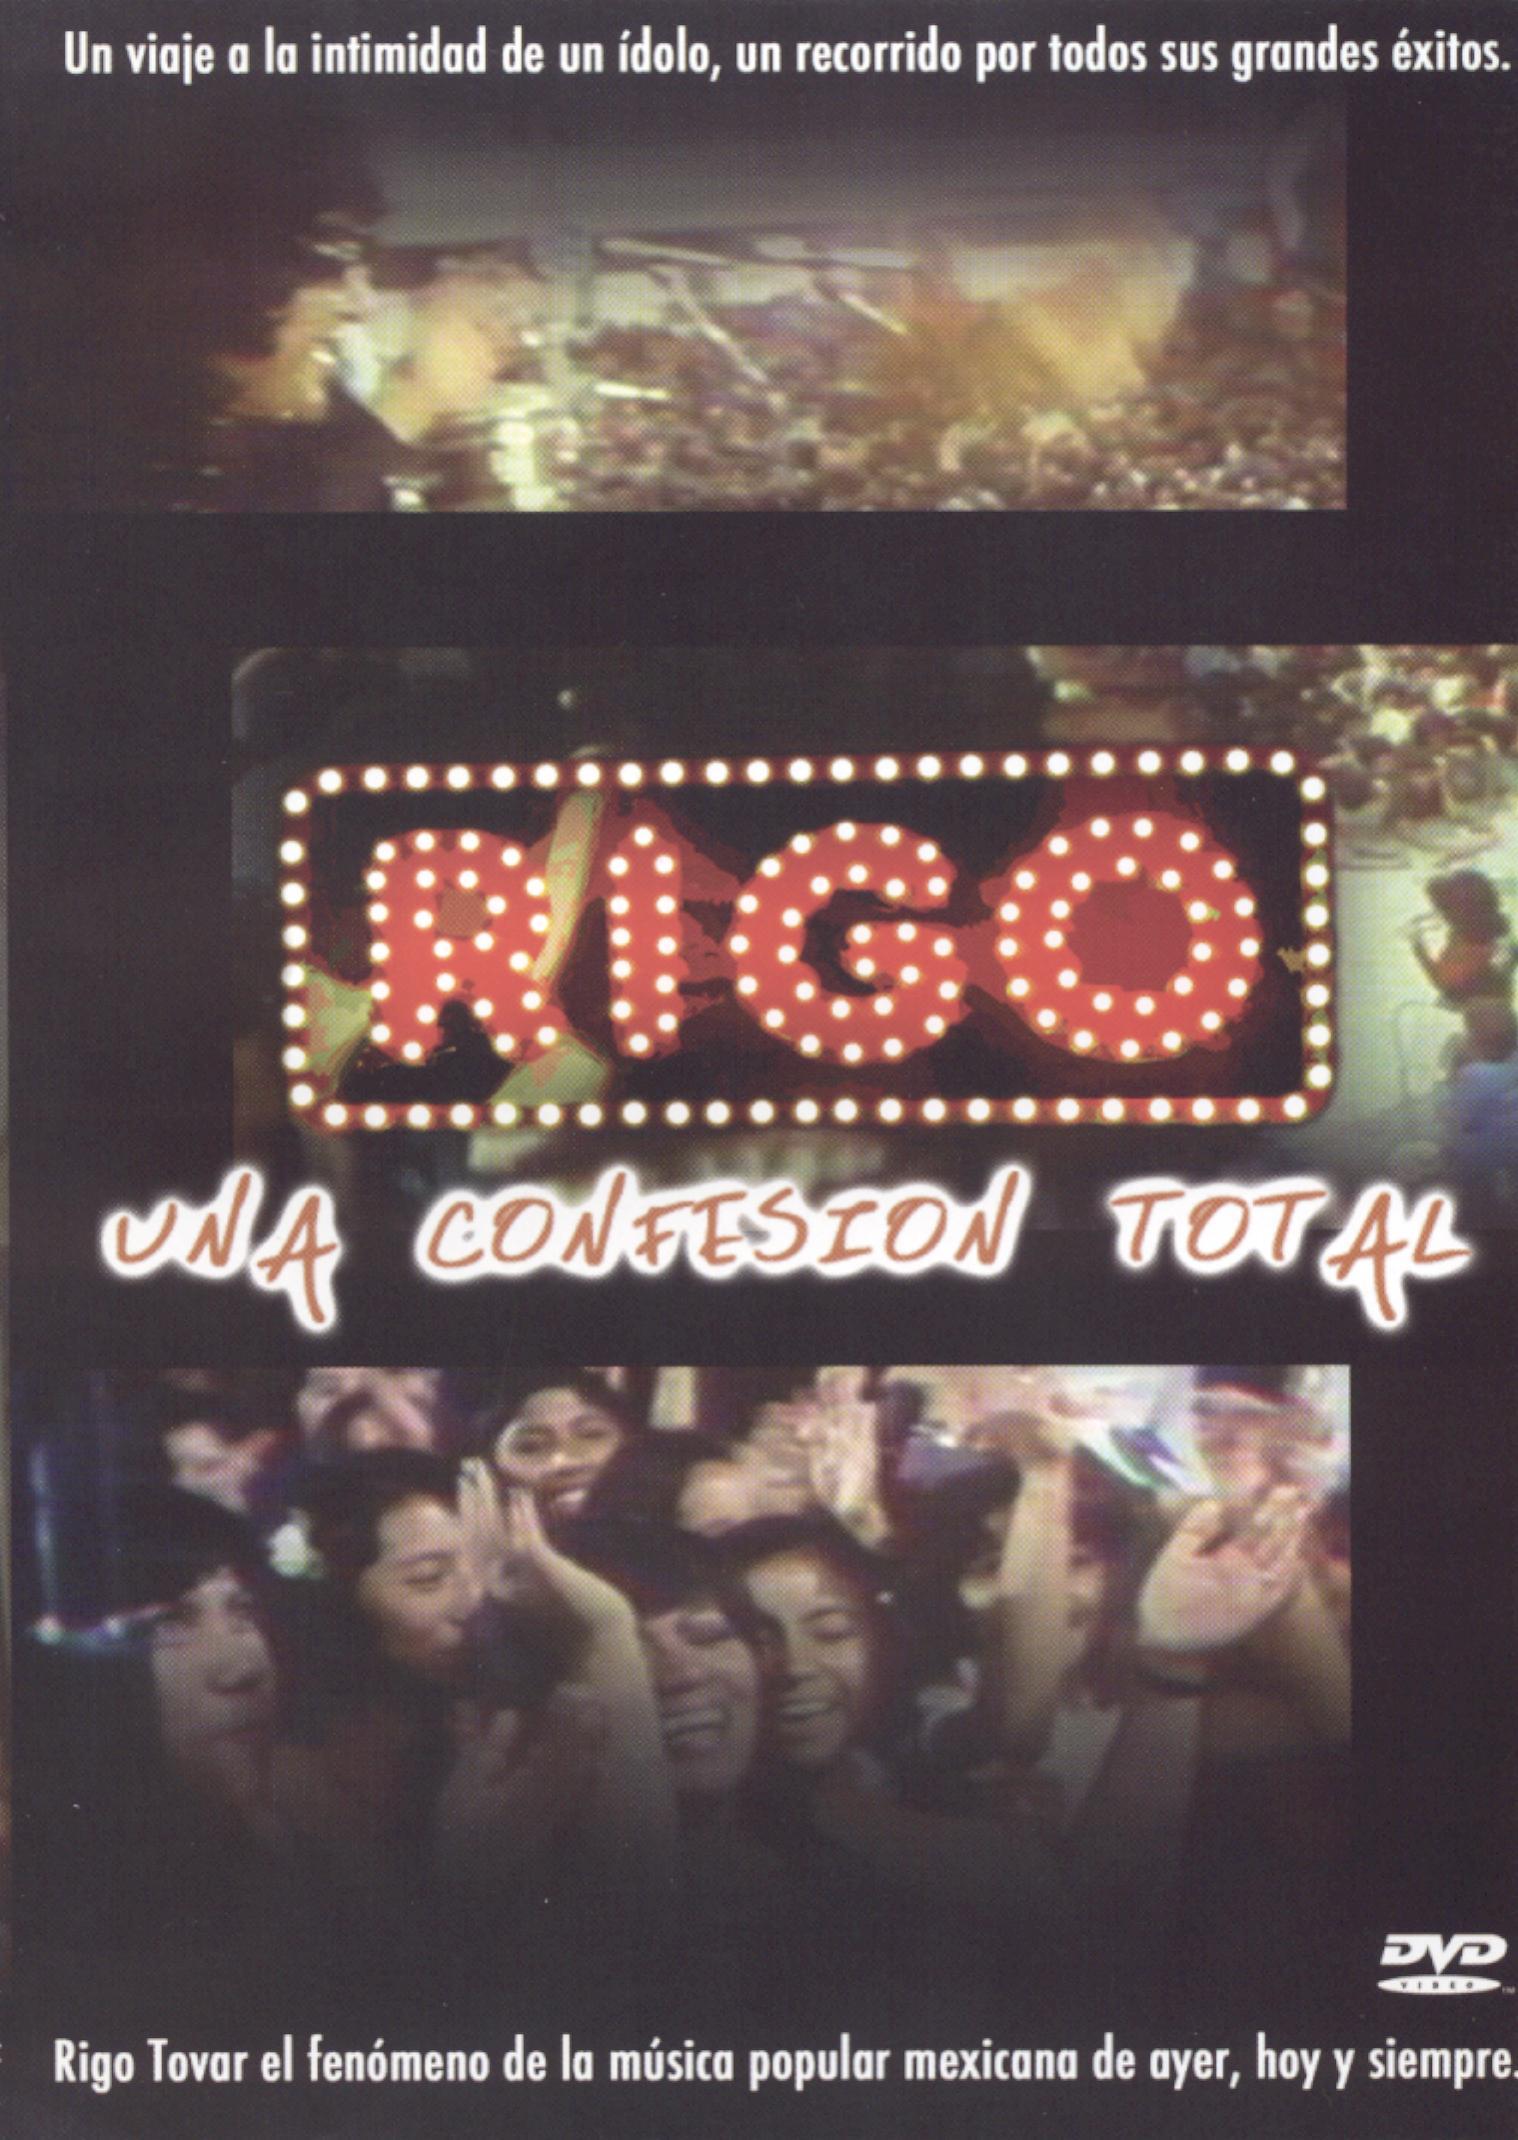 Rigo Tovar: Rigo - Una Confesion Total